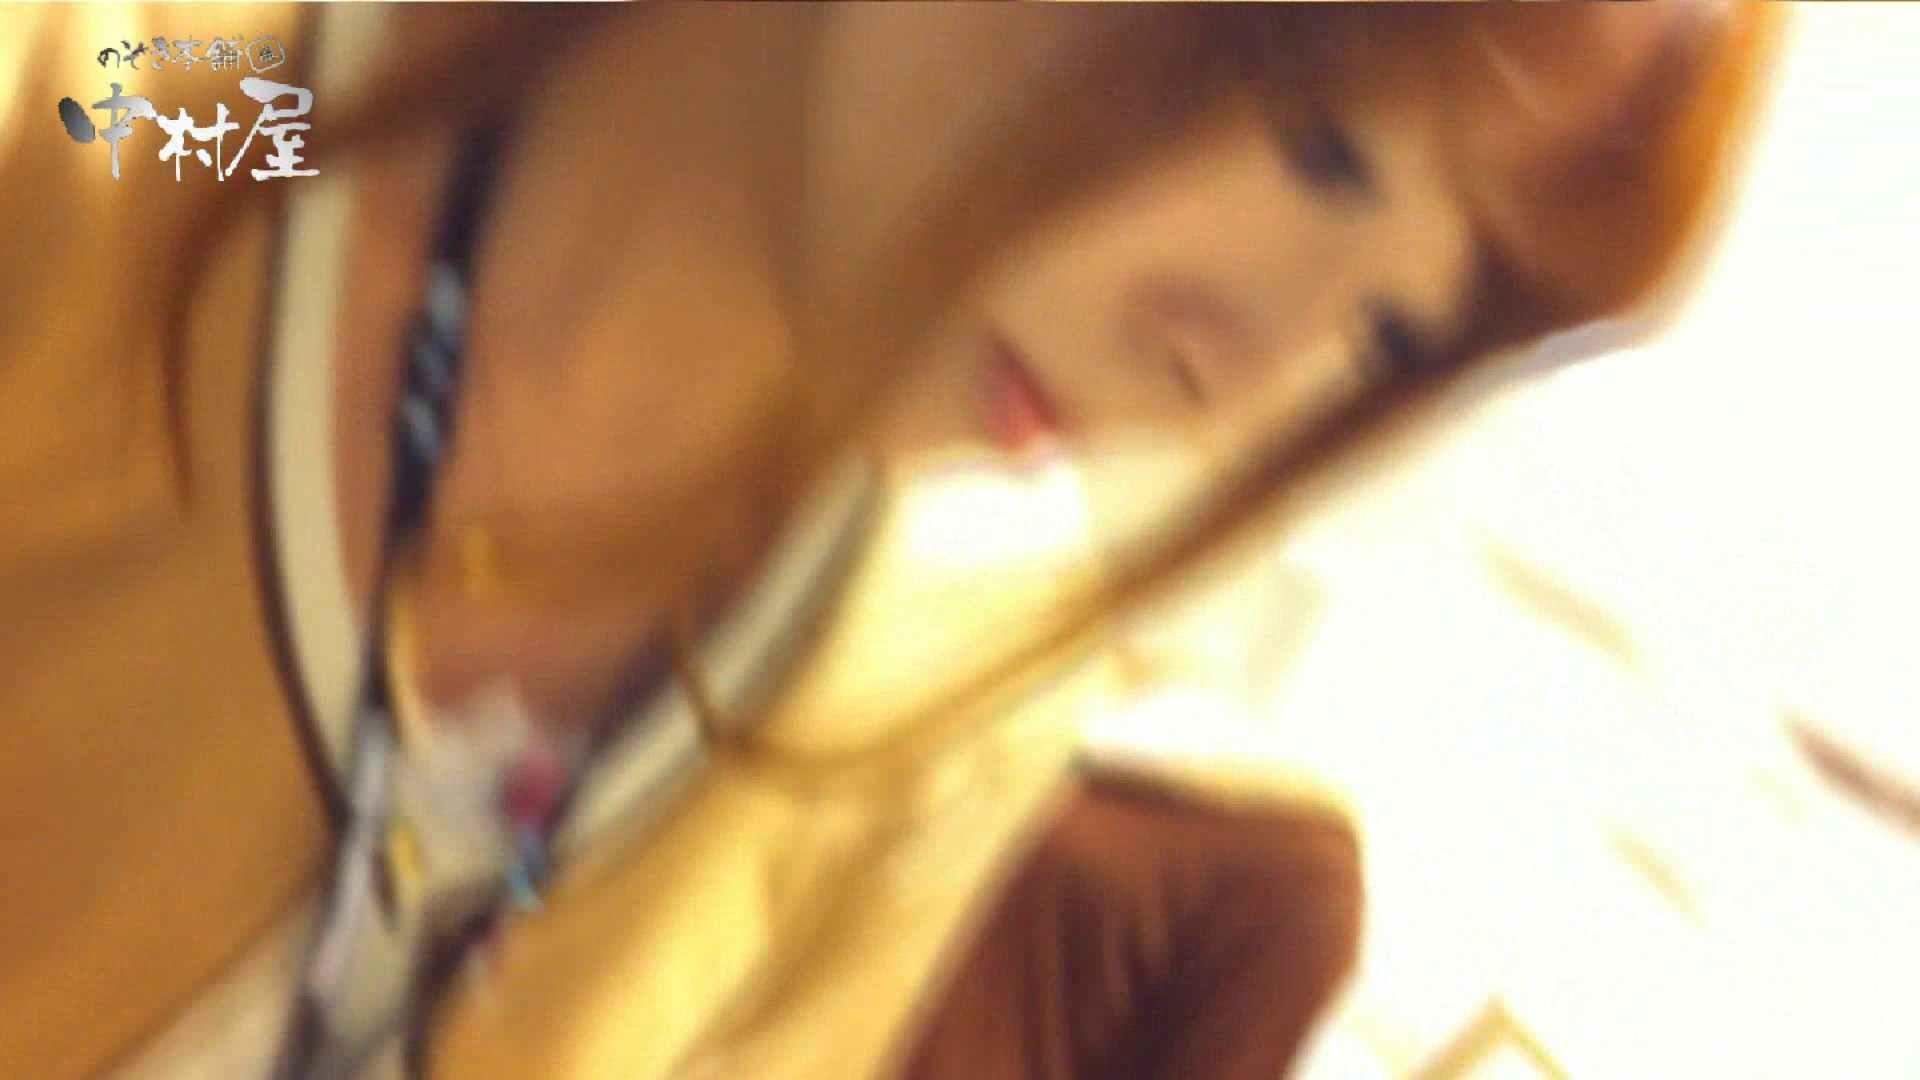 vol.46 可愛いカリスマ店員胸チラ&パンチラ モリマン! おまんこ 隠し撮りオマンコ動画紹介 53PIX 35